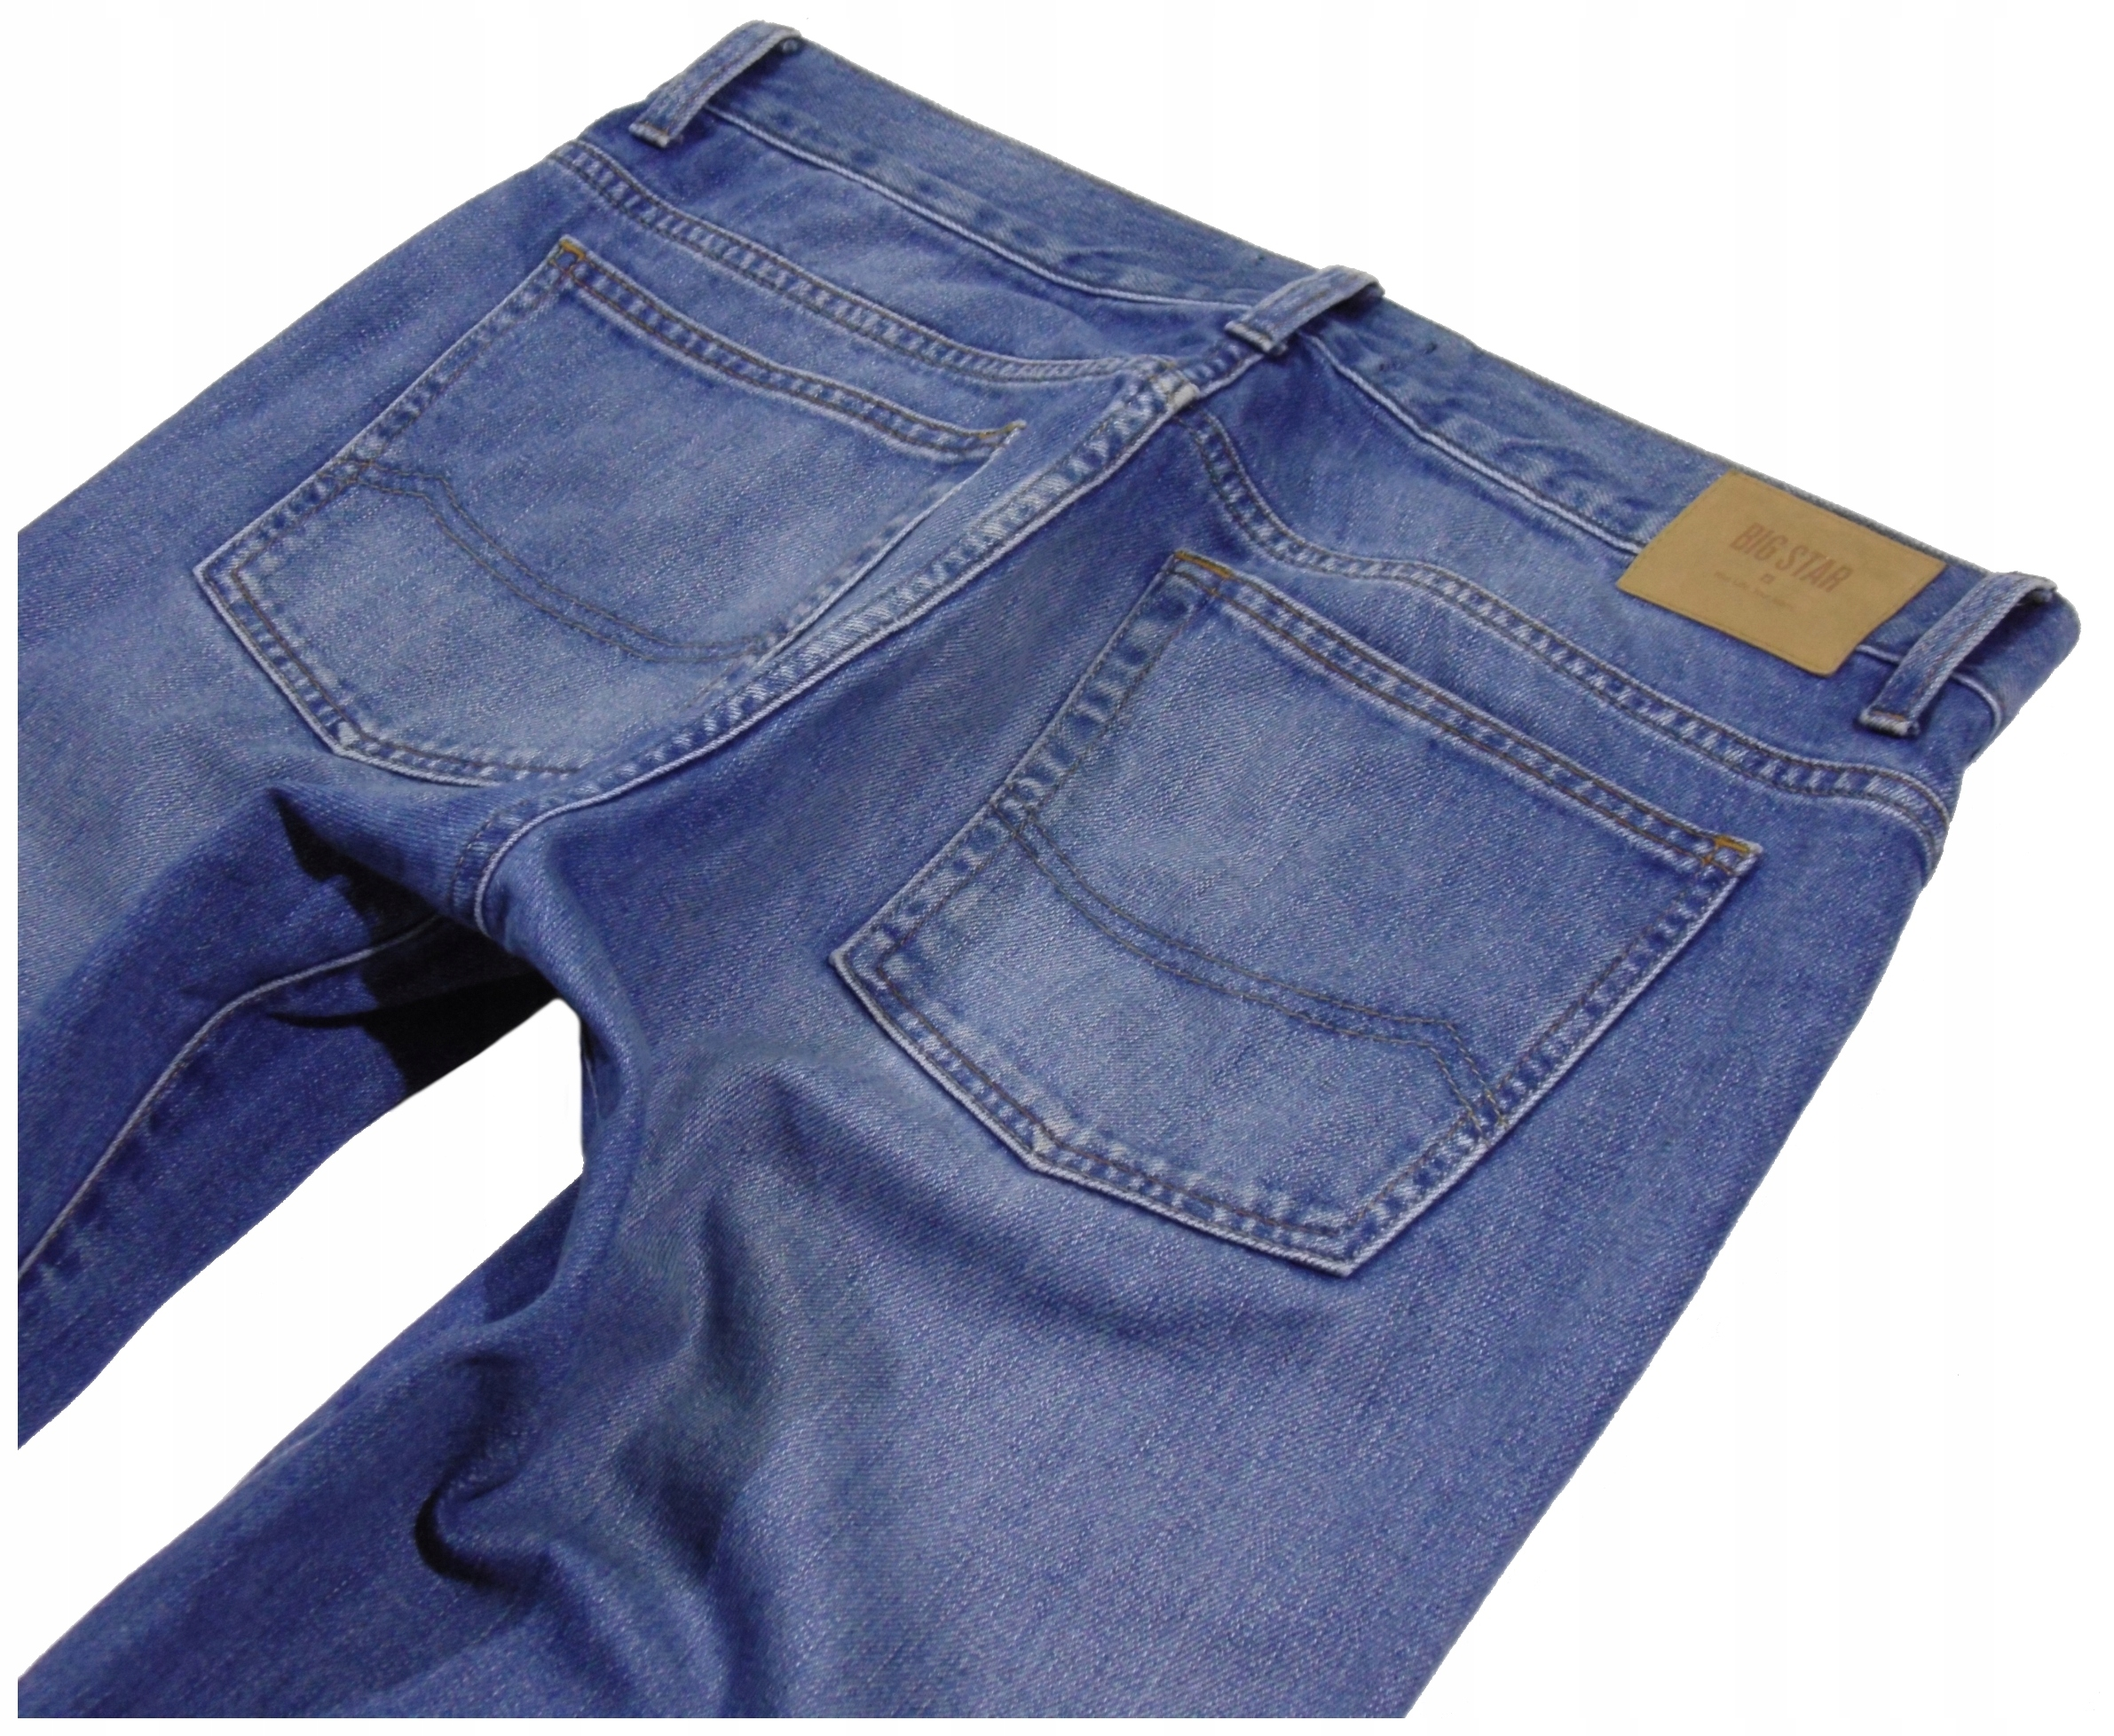 BIG STAR JONAS _ Spodnie Jeans _ 33/32 _ Pas 88